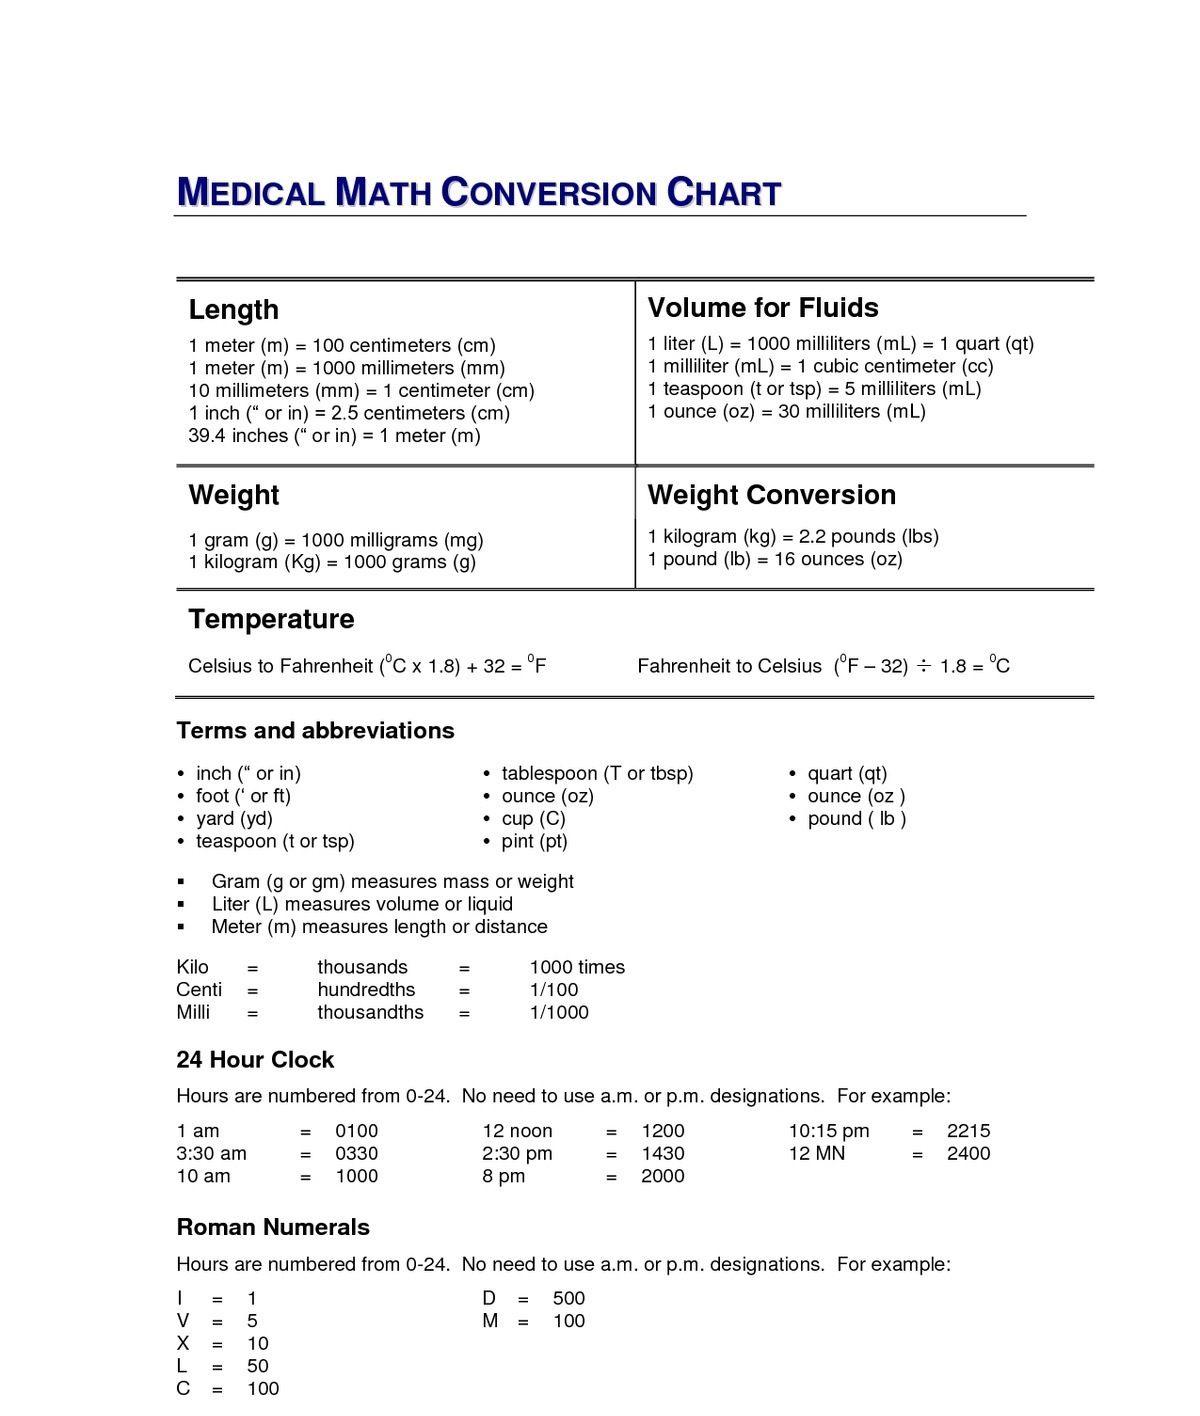 Med Math Conversion Chart